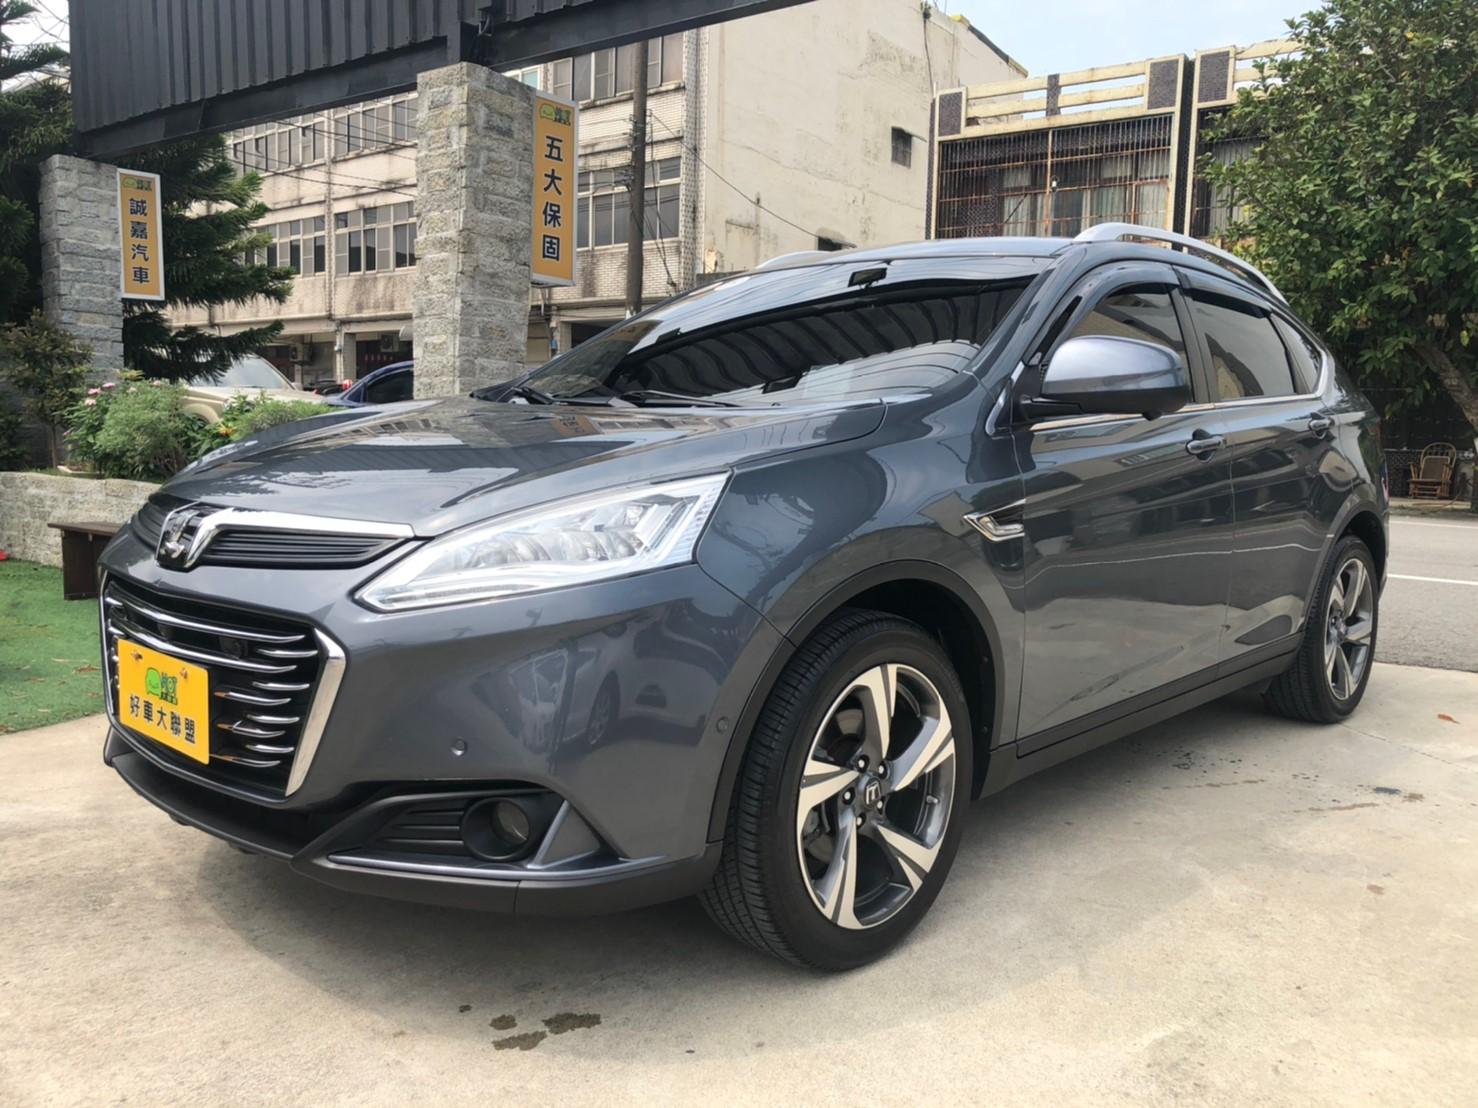 2018 Luxgen 納智捷 U6 turbo